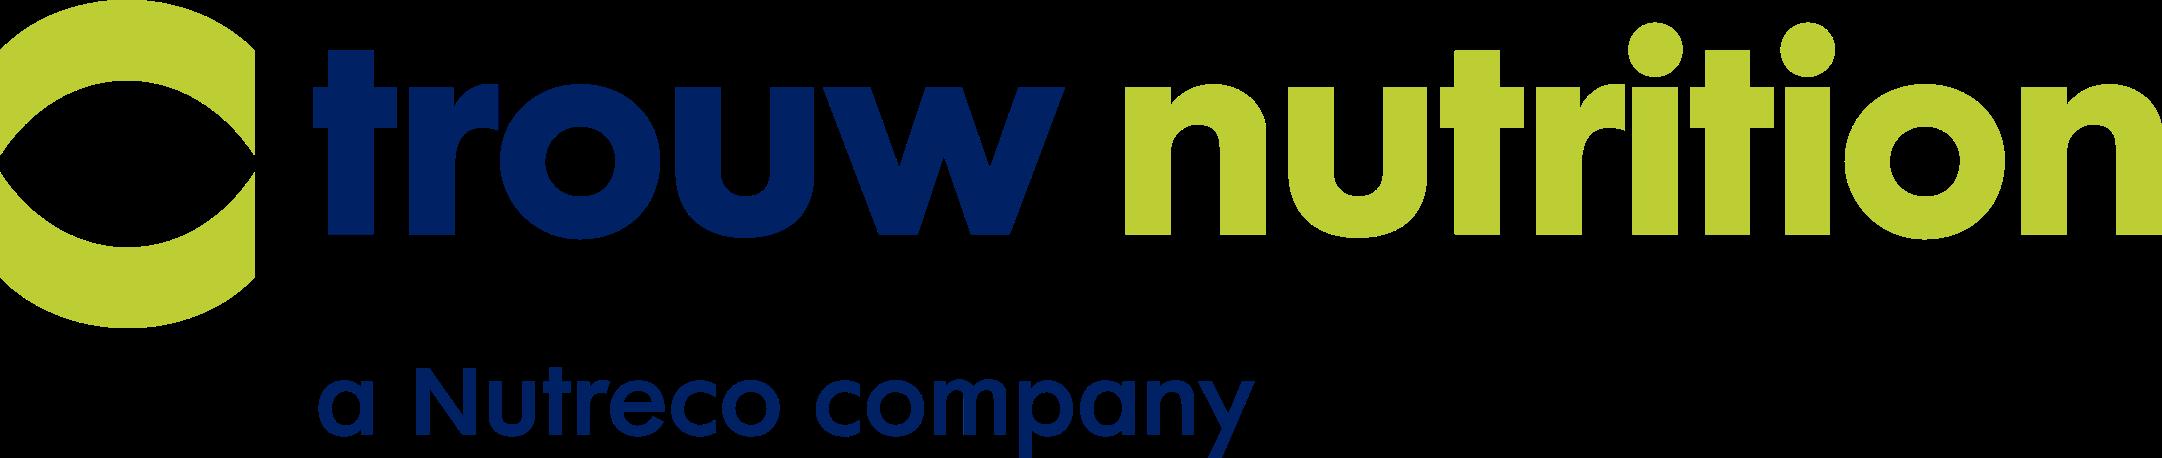 trouw nutrition logo 1 - Trouw Nutrition Logo